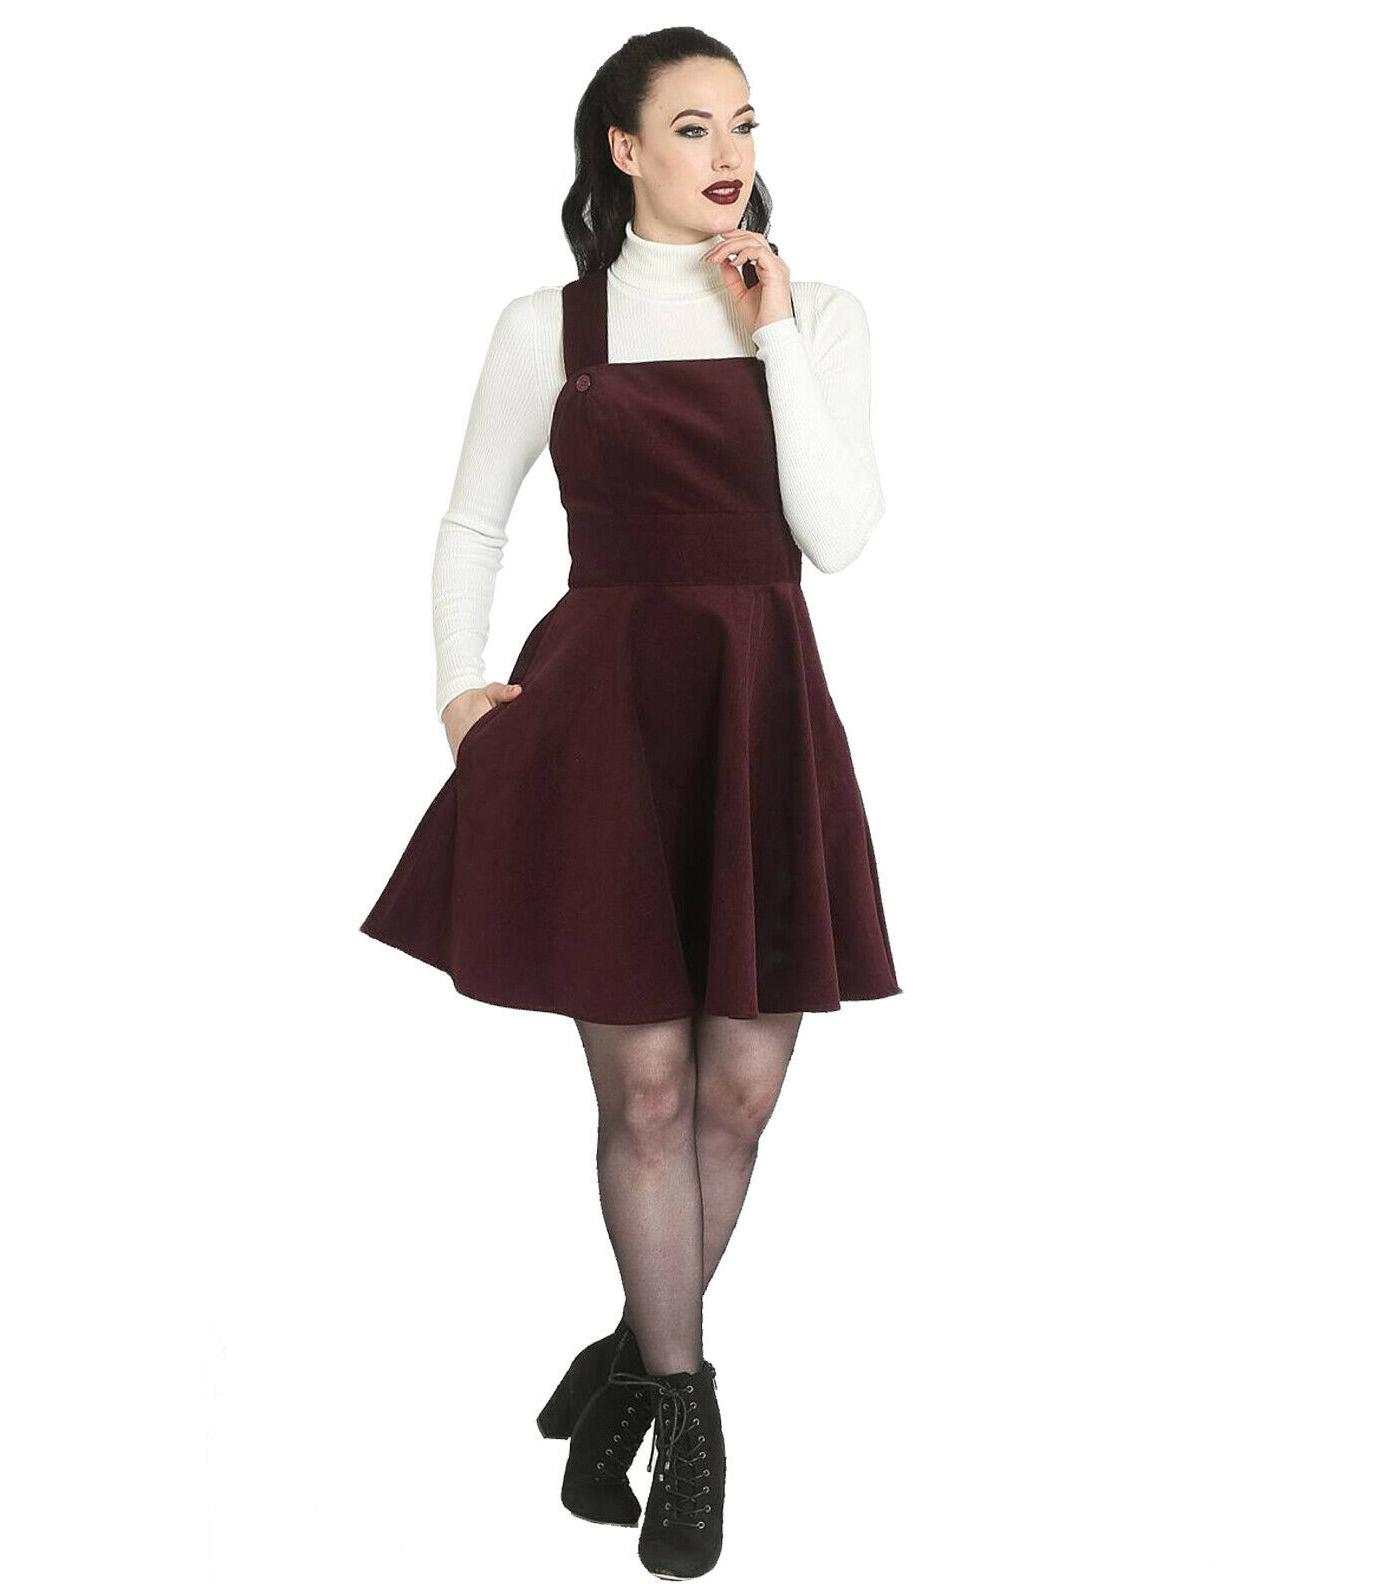 Hell-Bunny-Rockabilly-Corduroy-Mini-Dress-WONDER-YEARS-Pinafore-Wine-All-Sizes thumbnail 19